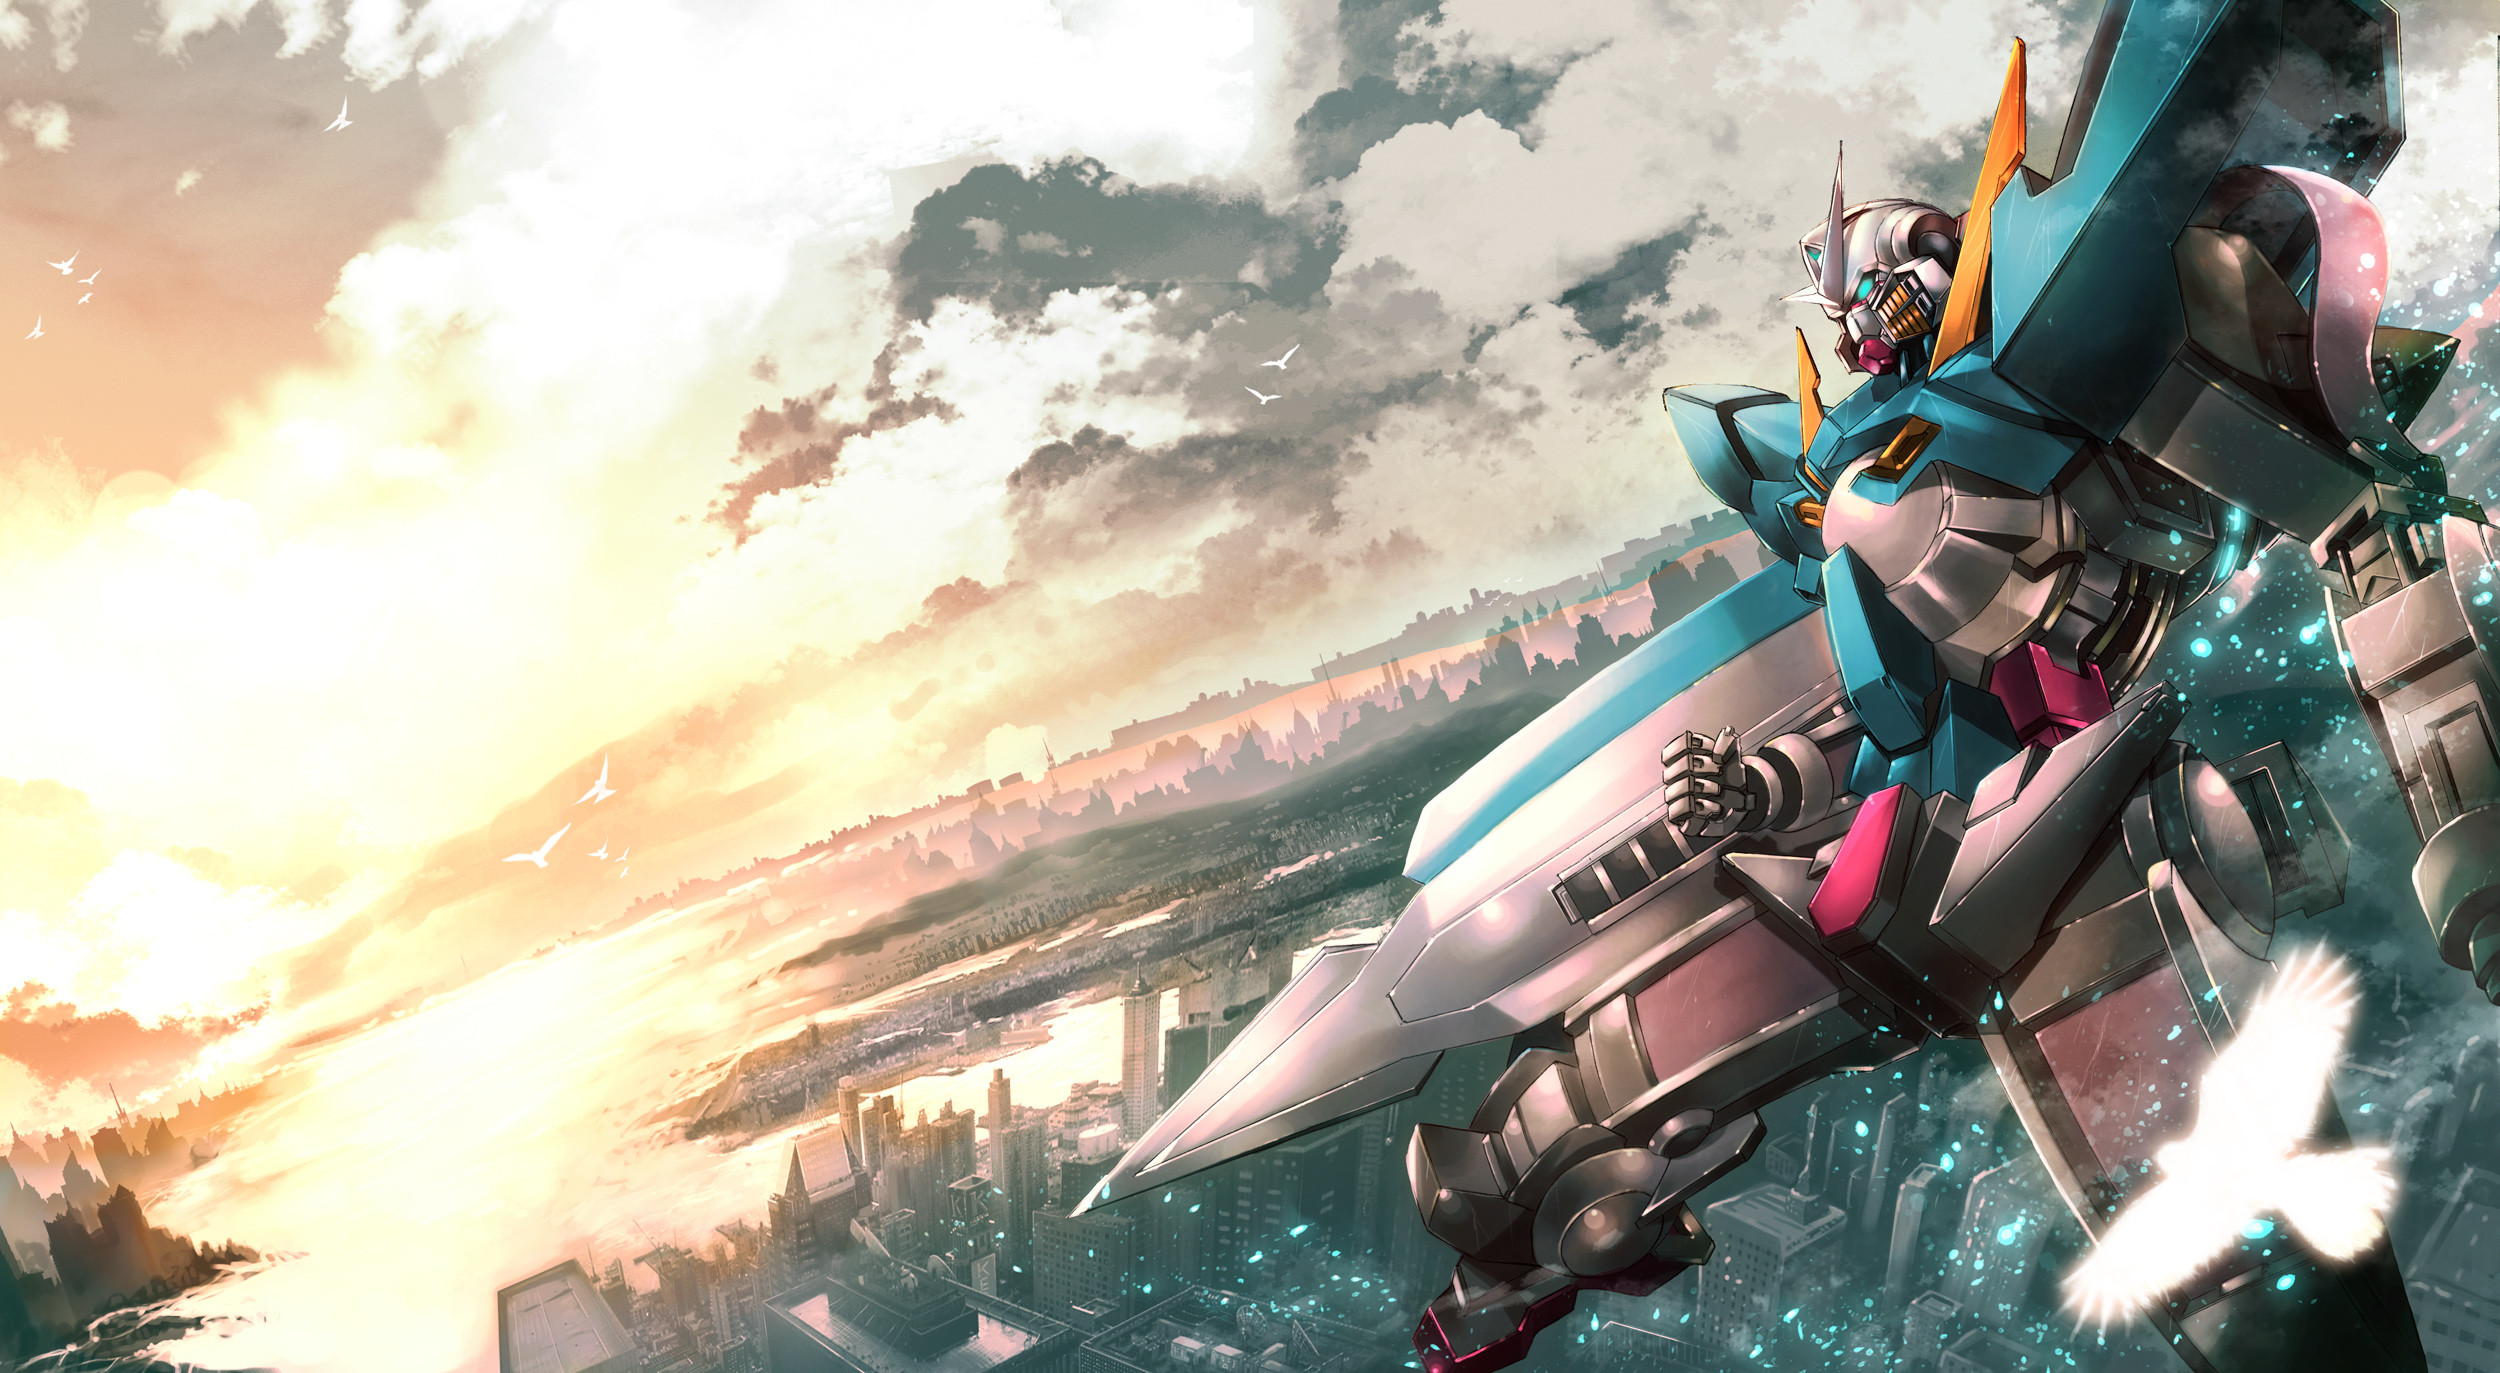 Gundam Wallpapers (65+ images)